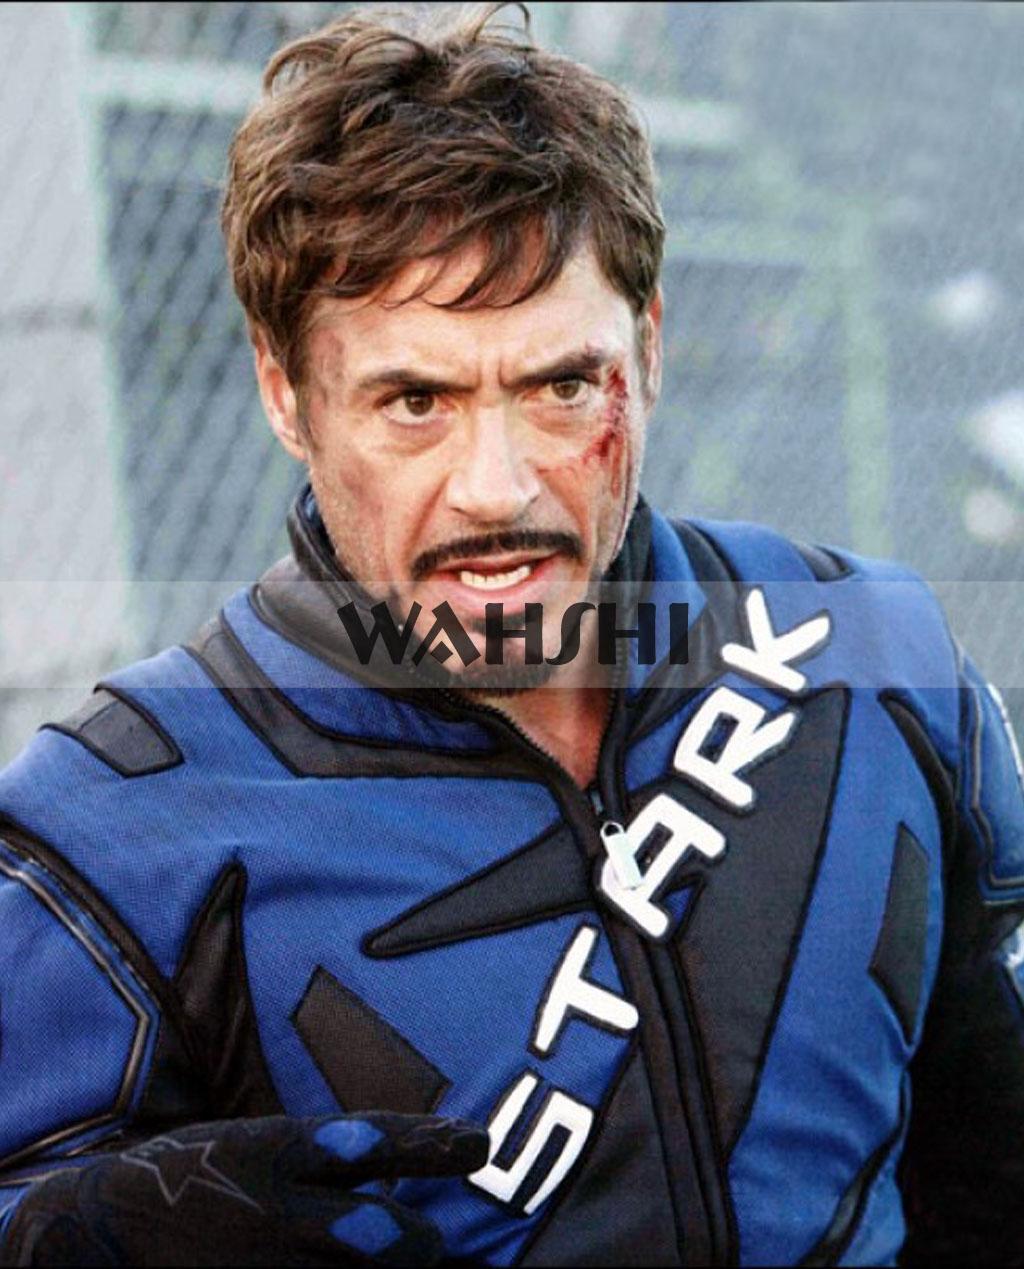 Iron-man-2-robert-downey-costume